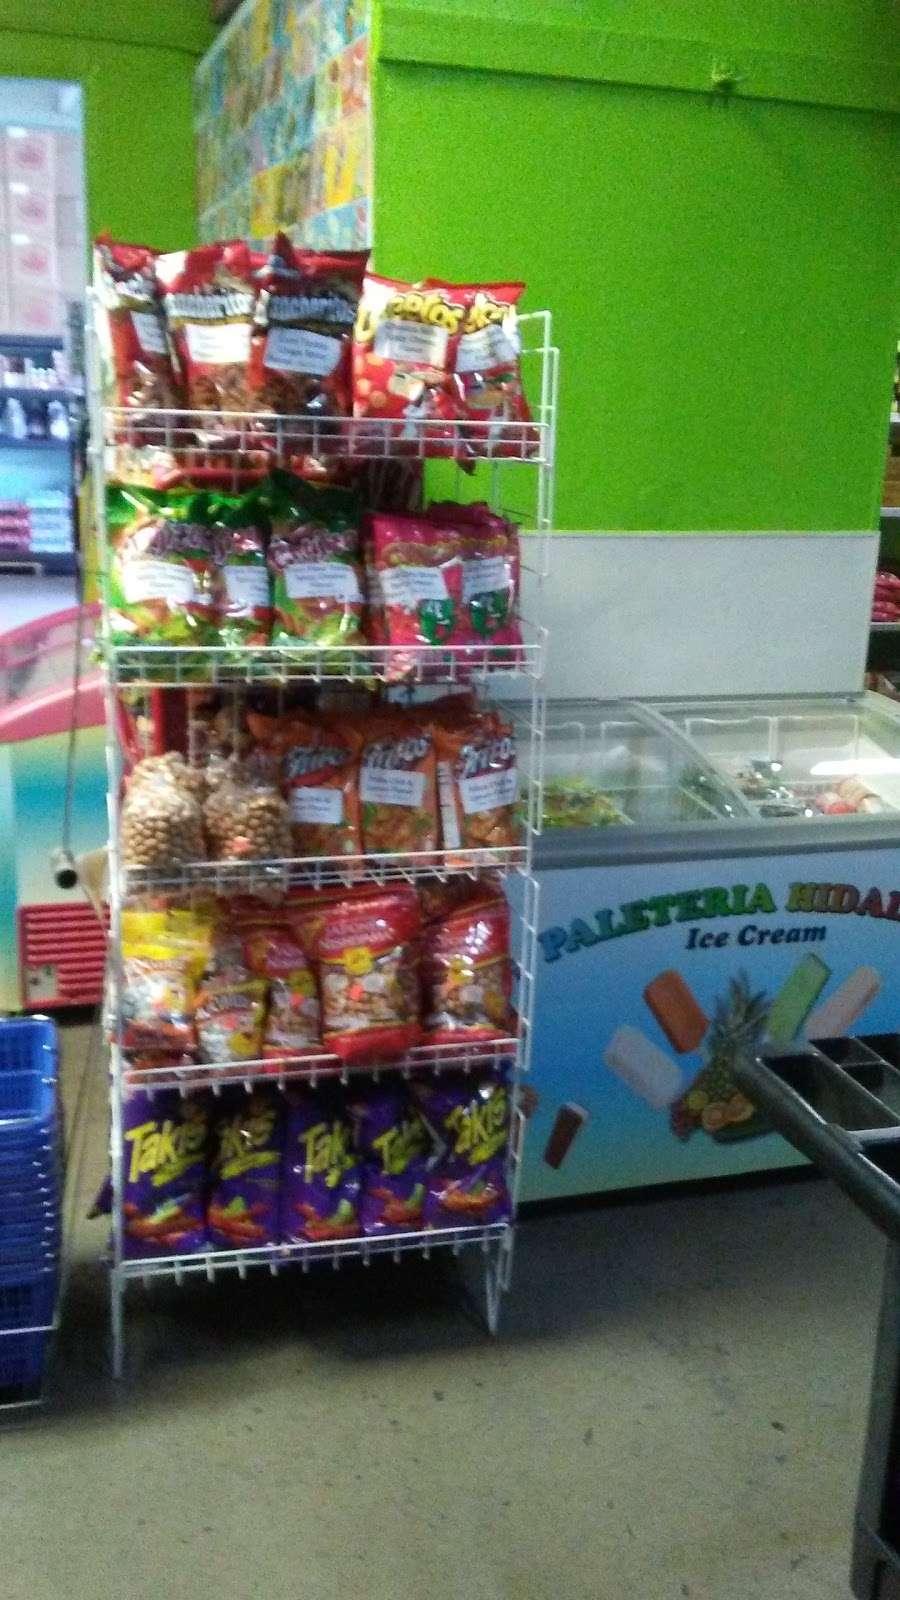 Paleteria Hidalgo - store    Photo 9 of 10   Address: 16565 Orange Way # I, Fontana, CA 92335, USA   Phone: (909) 350-4130